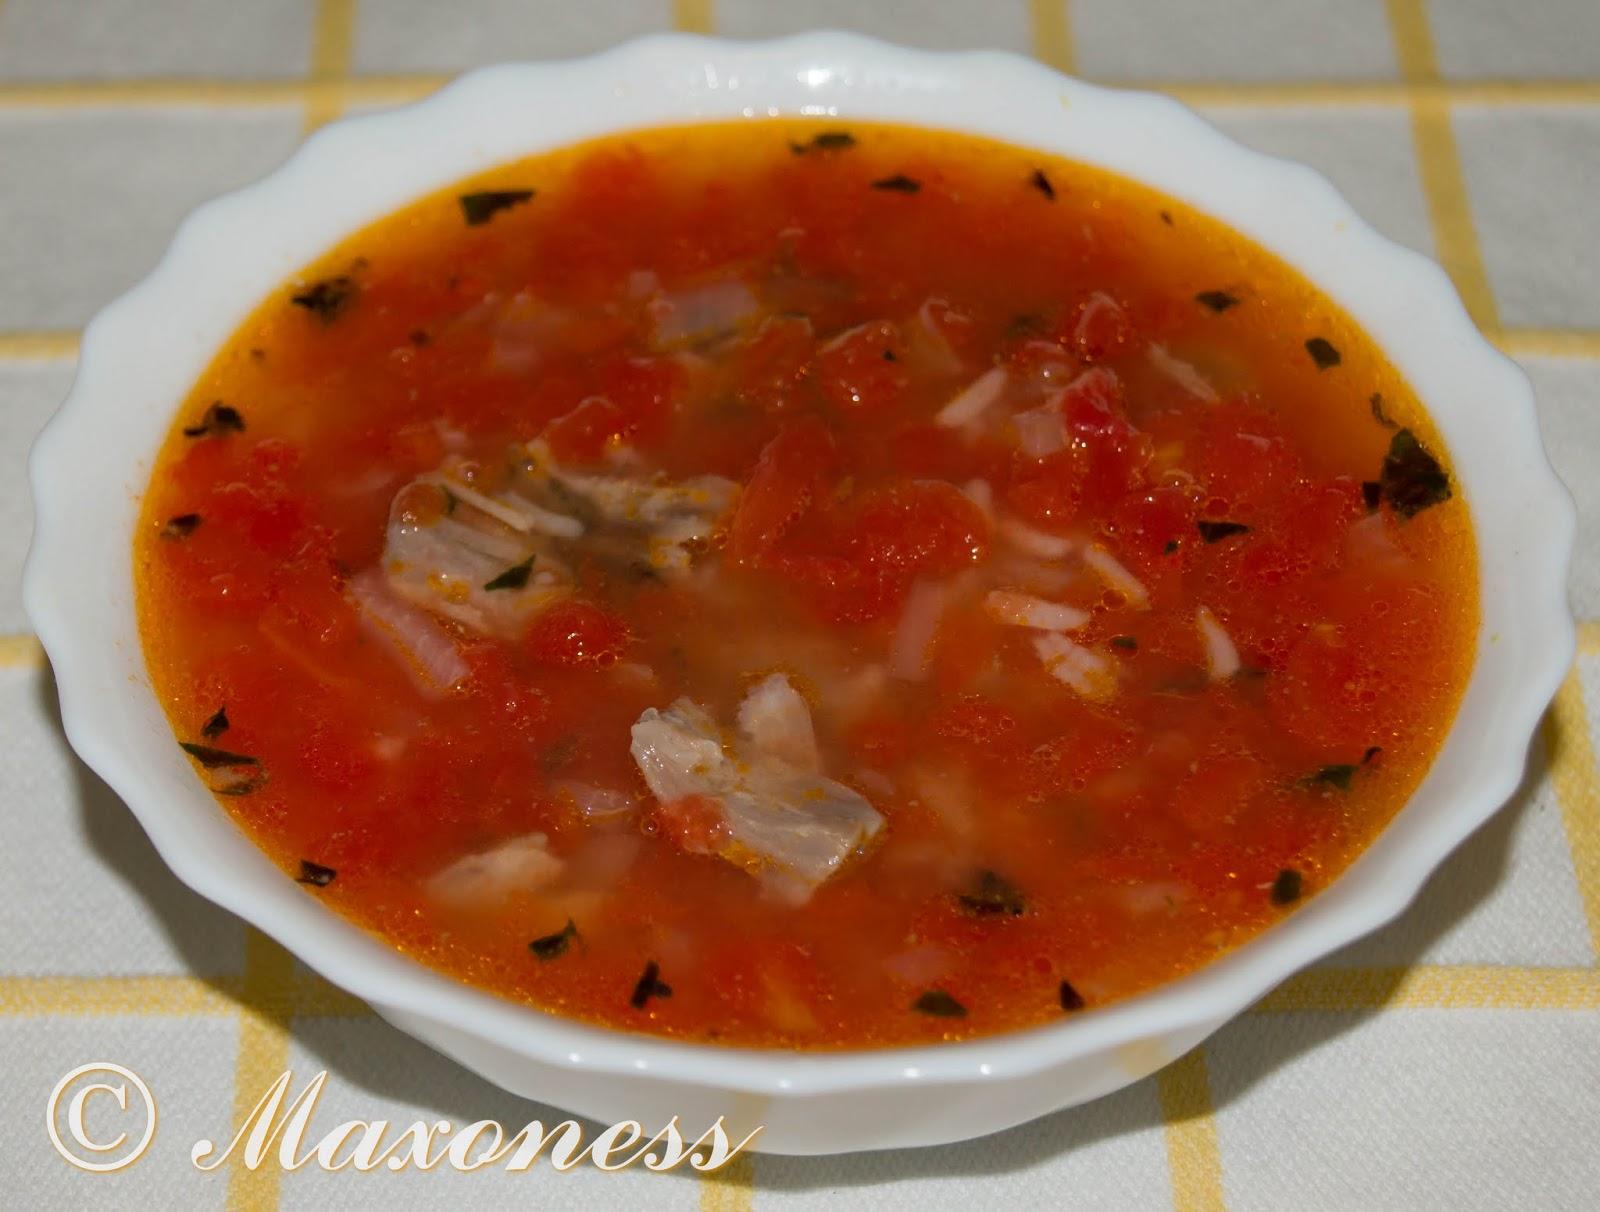 арабская супы рецепты с фото